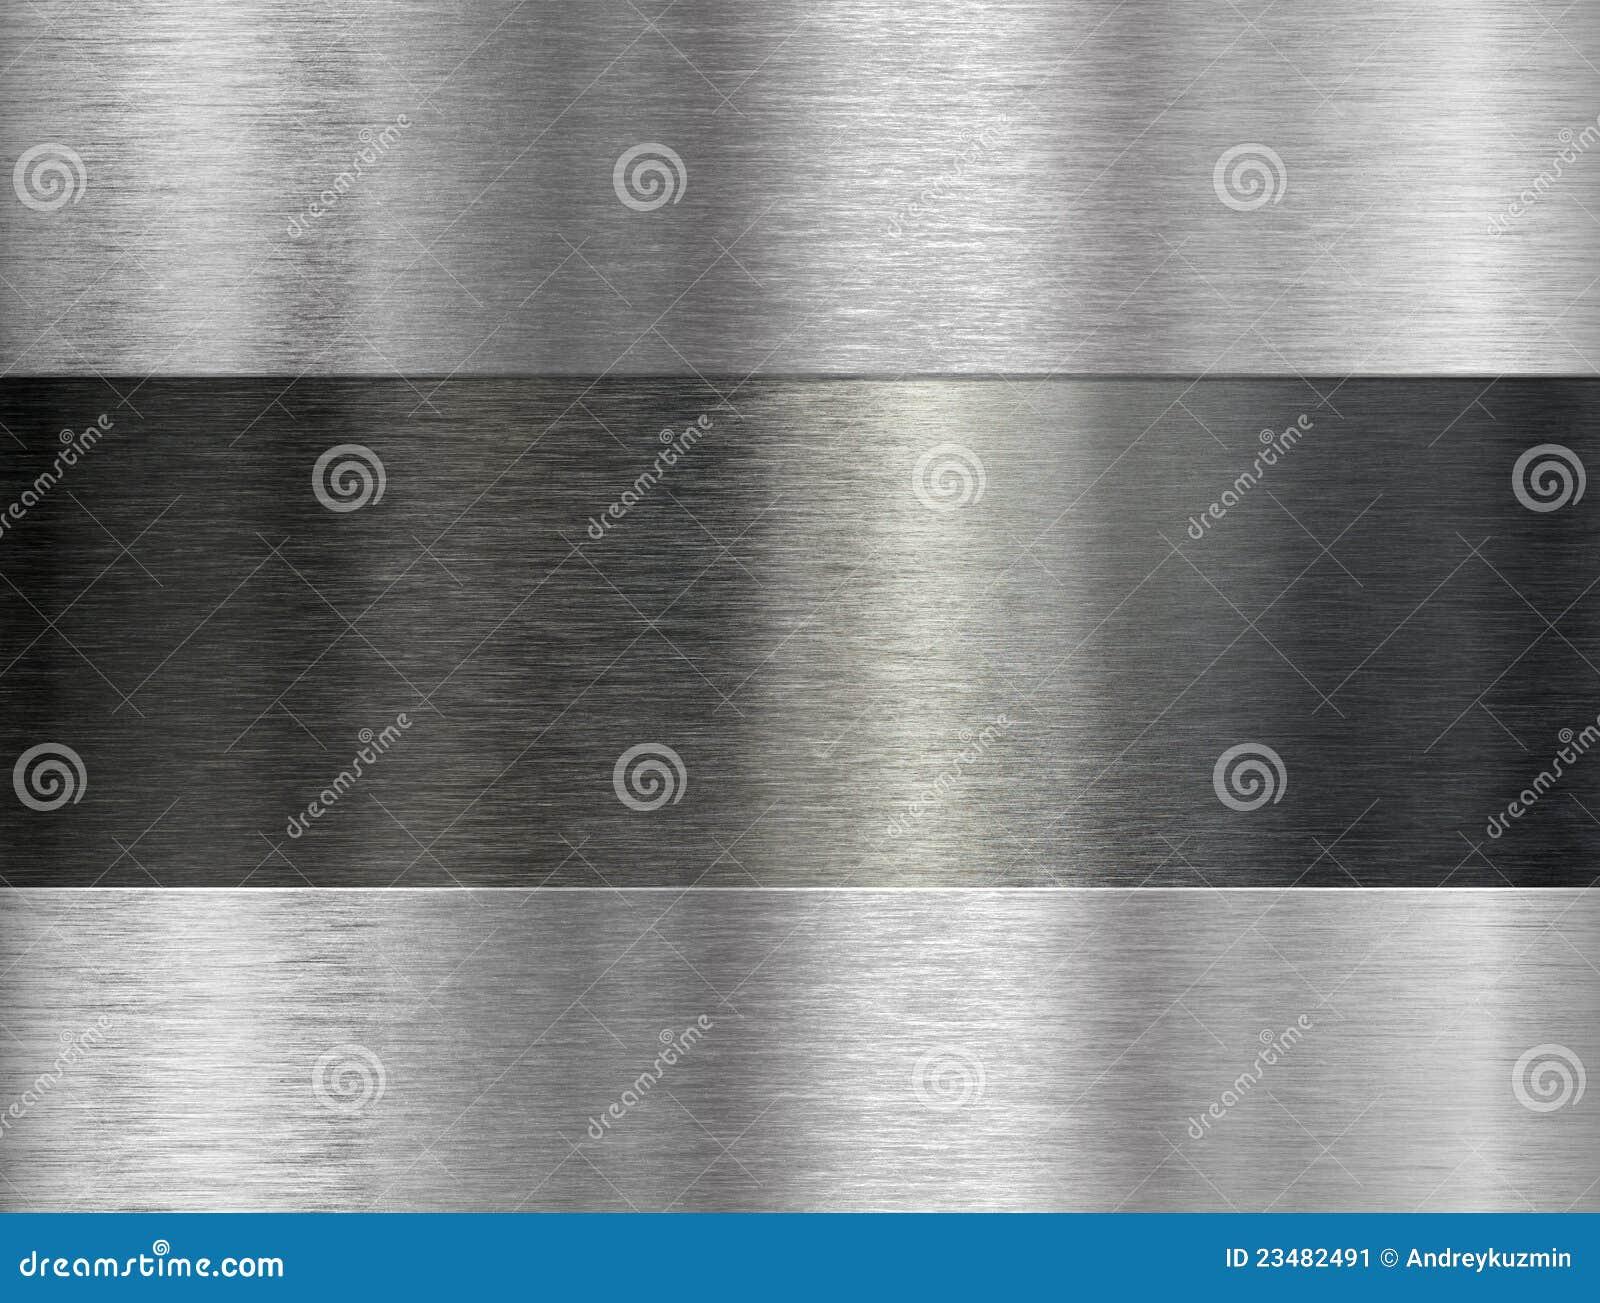 Brushed metal industrial background